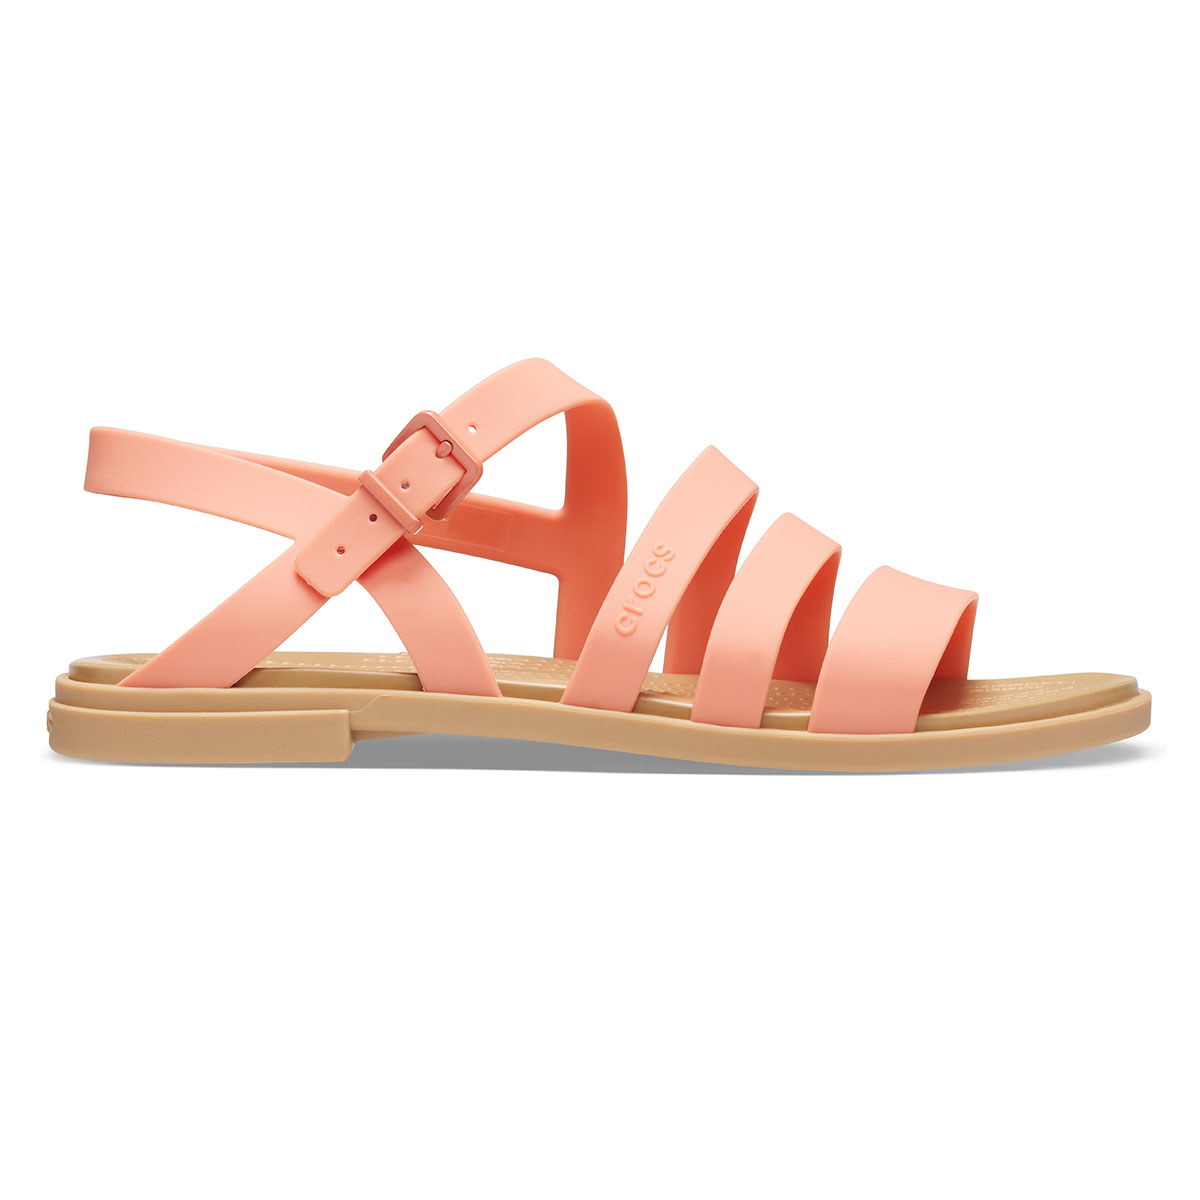 Crocs Tulum Sandal W-Greyfurt/Taba rengi